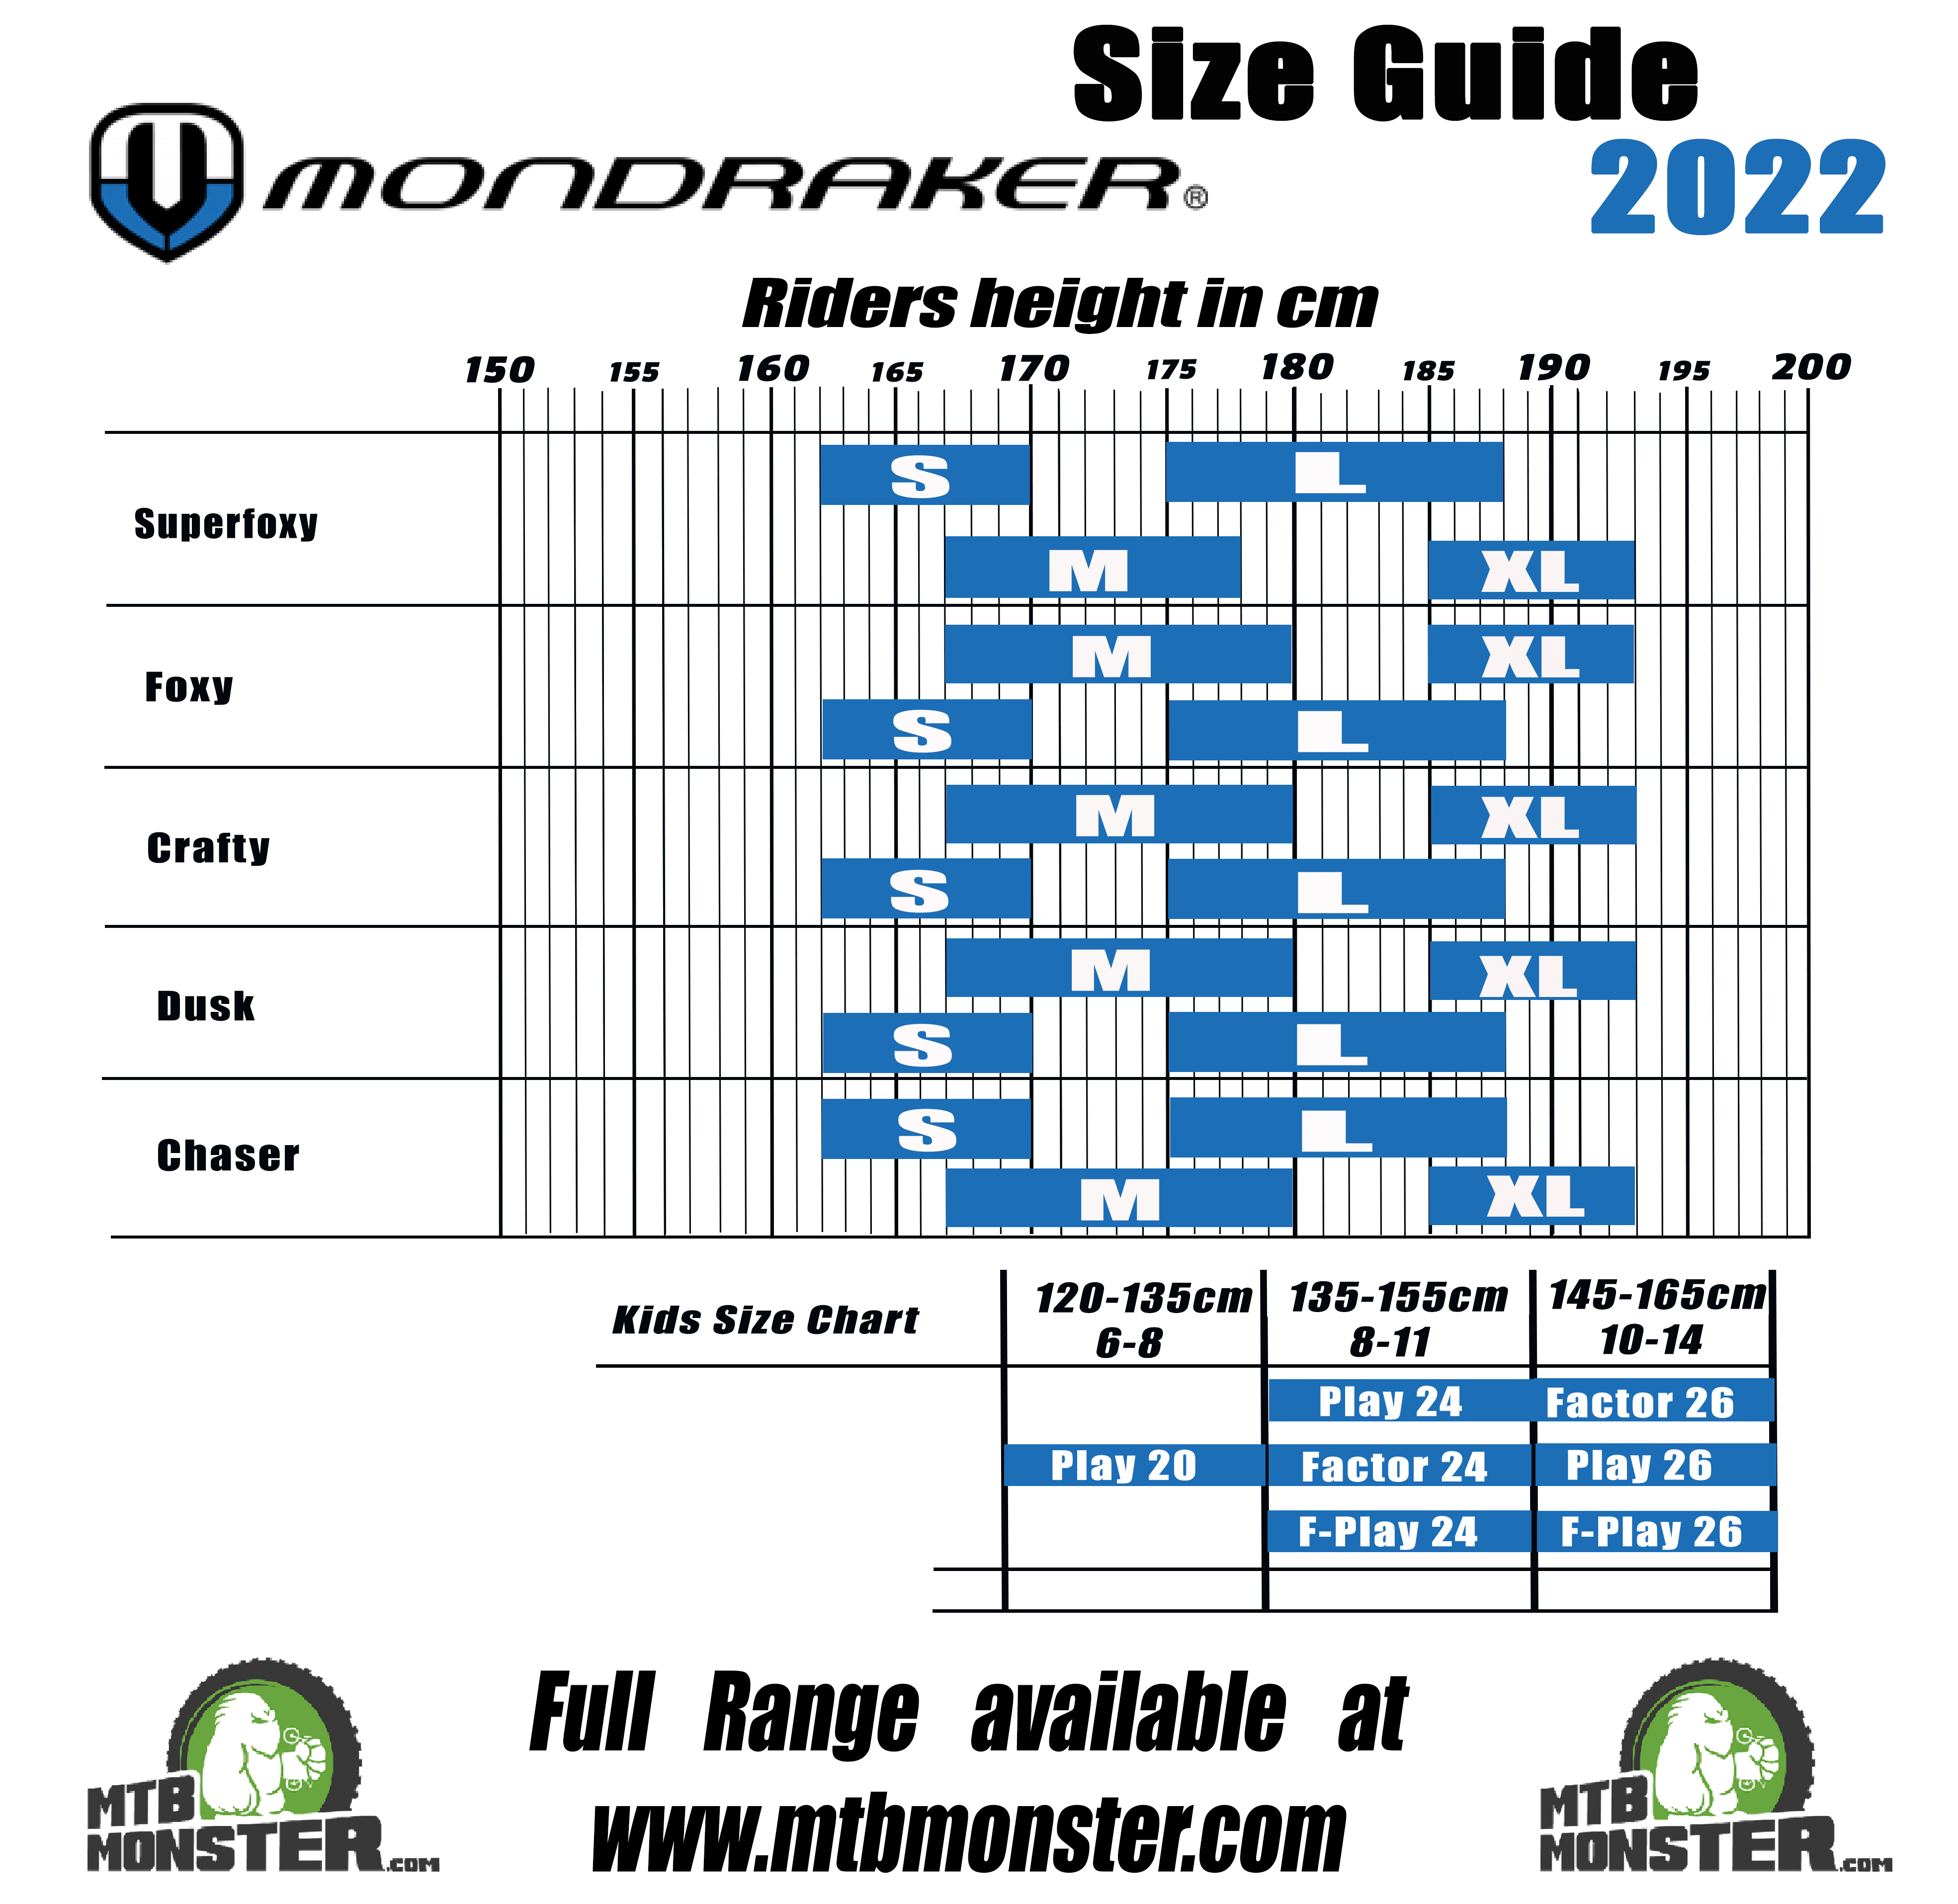 mondraker-size-chart-2022